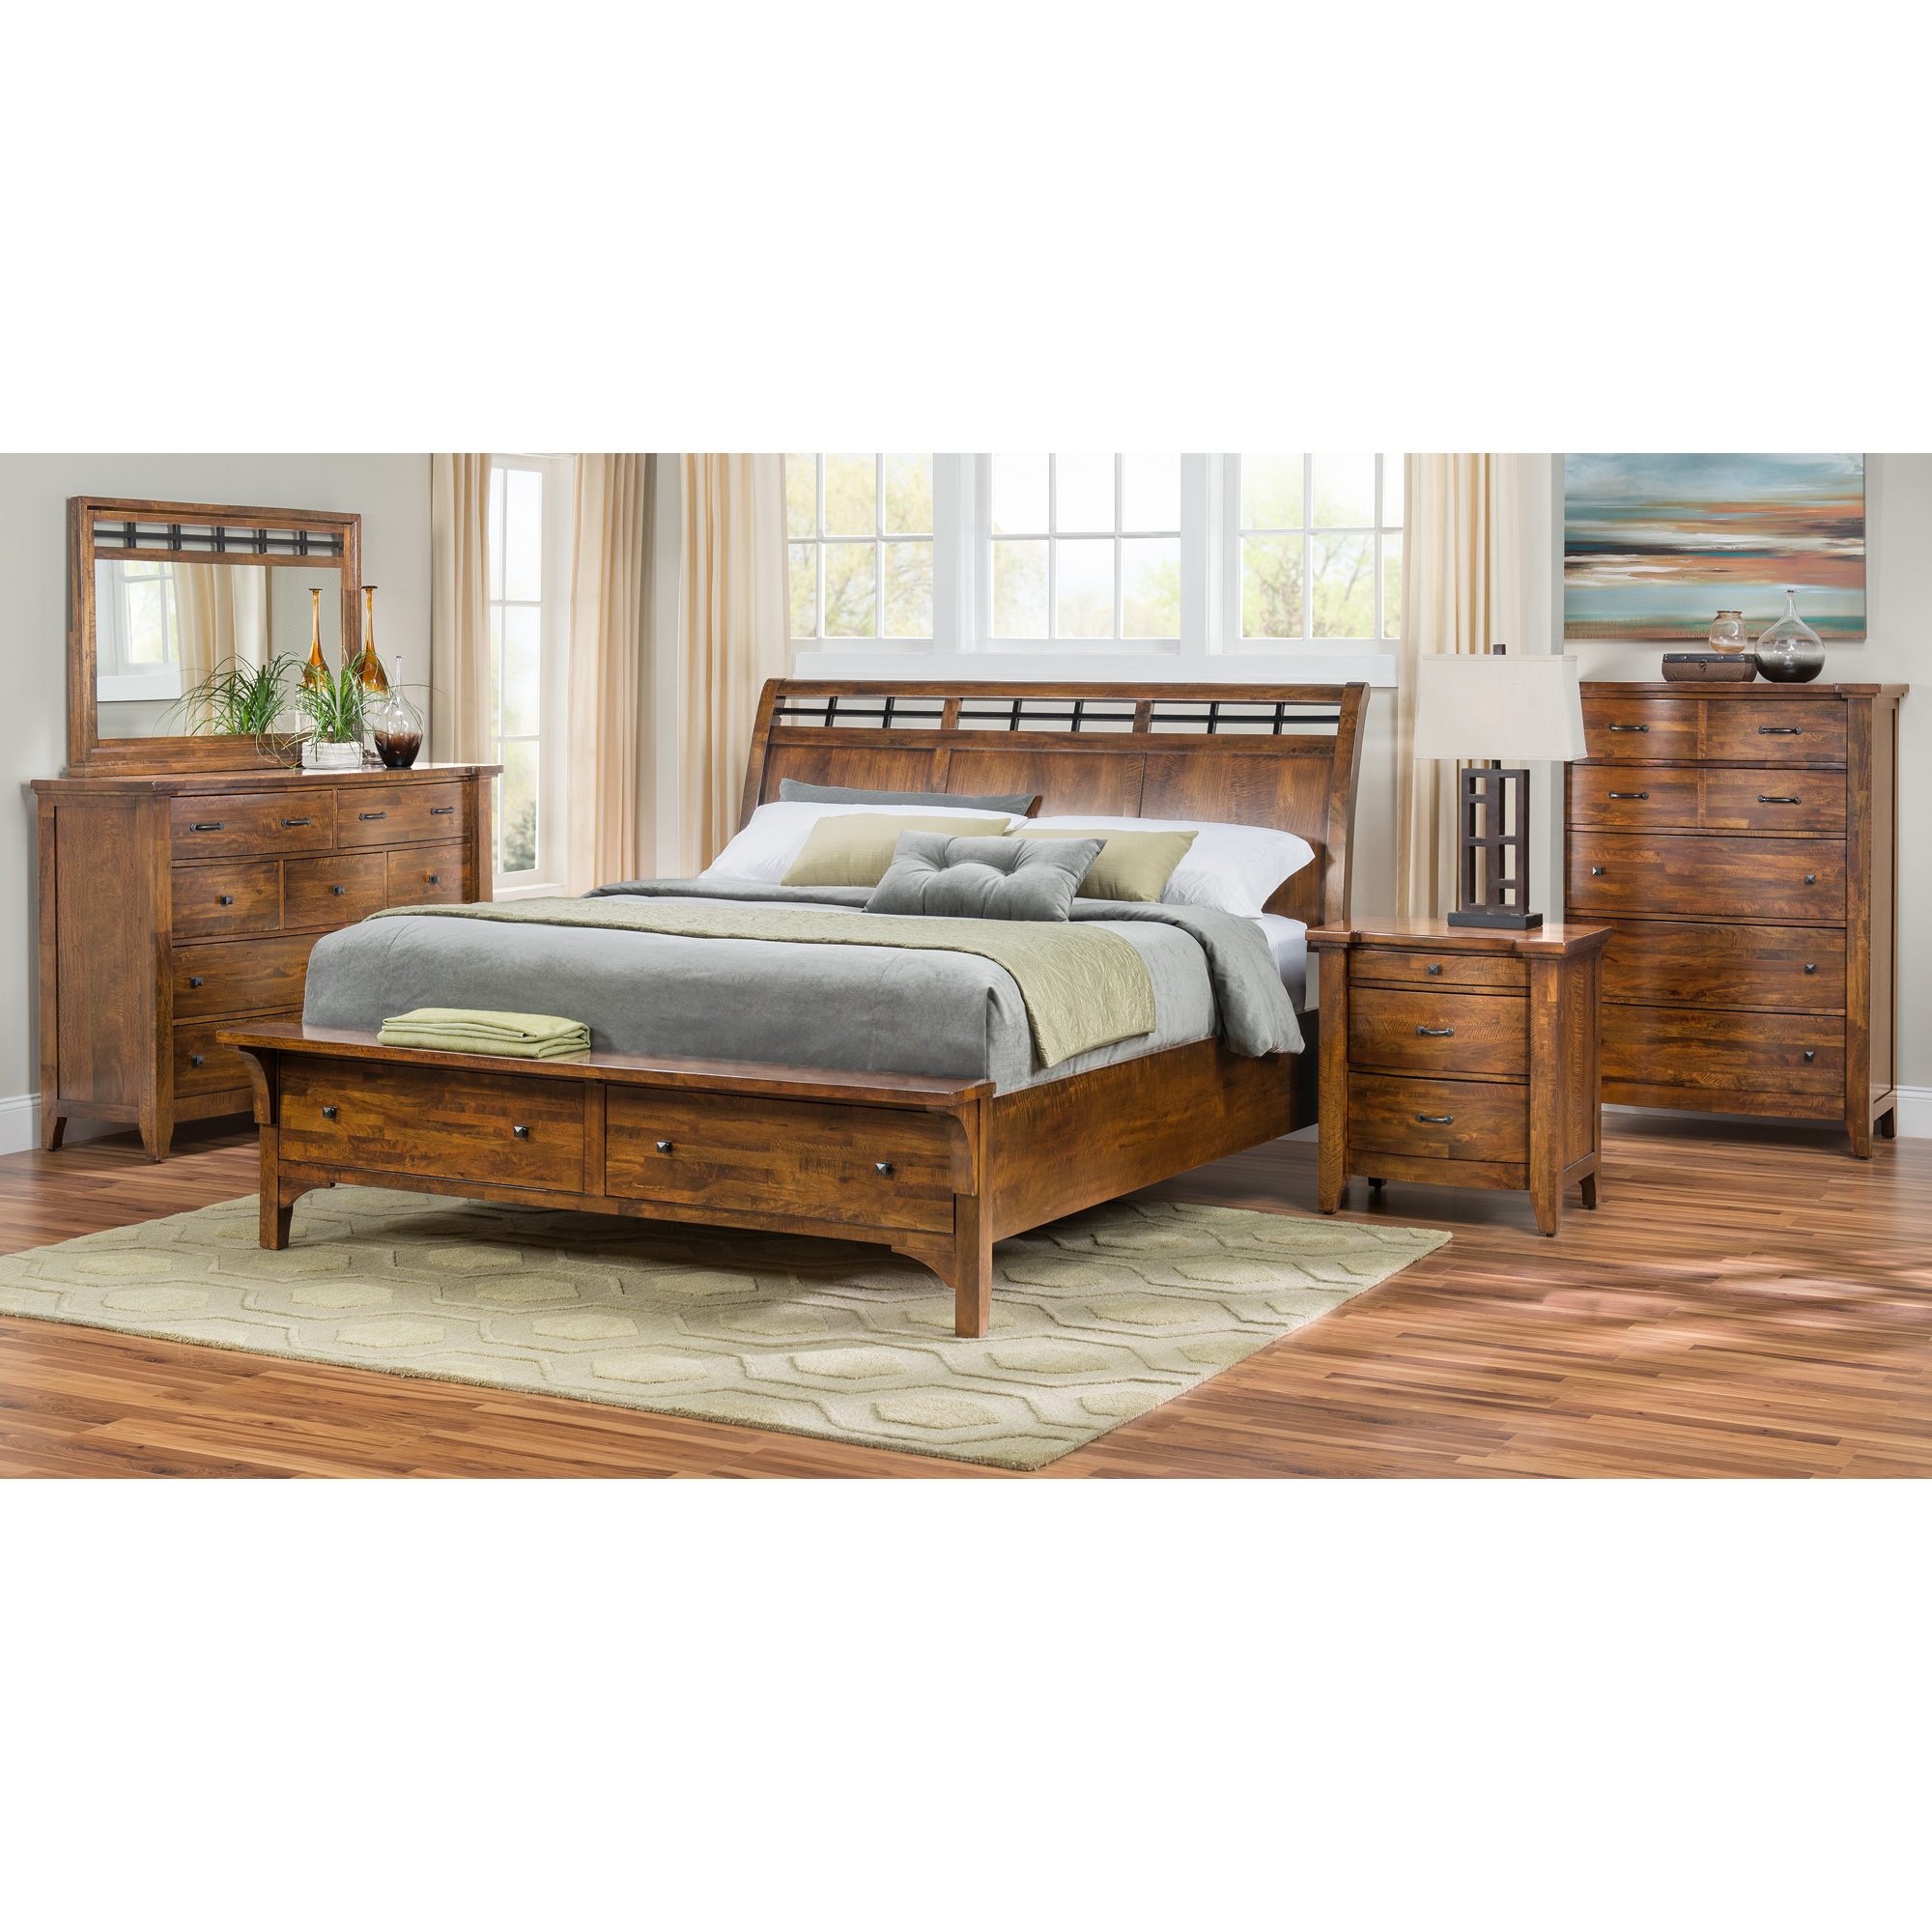 Napa Furniture | Whistler Retreat Dark Walnut King Storage 4 Piece Room Group Bedroom Set